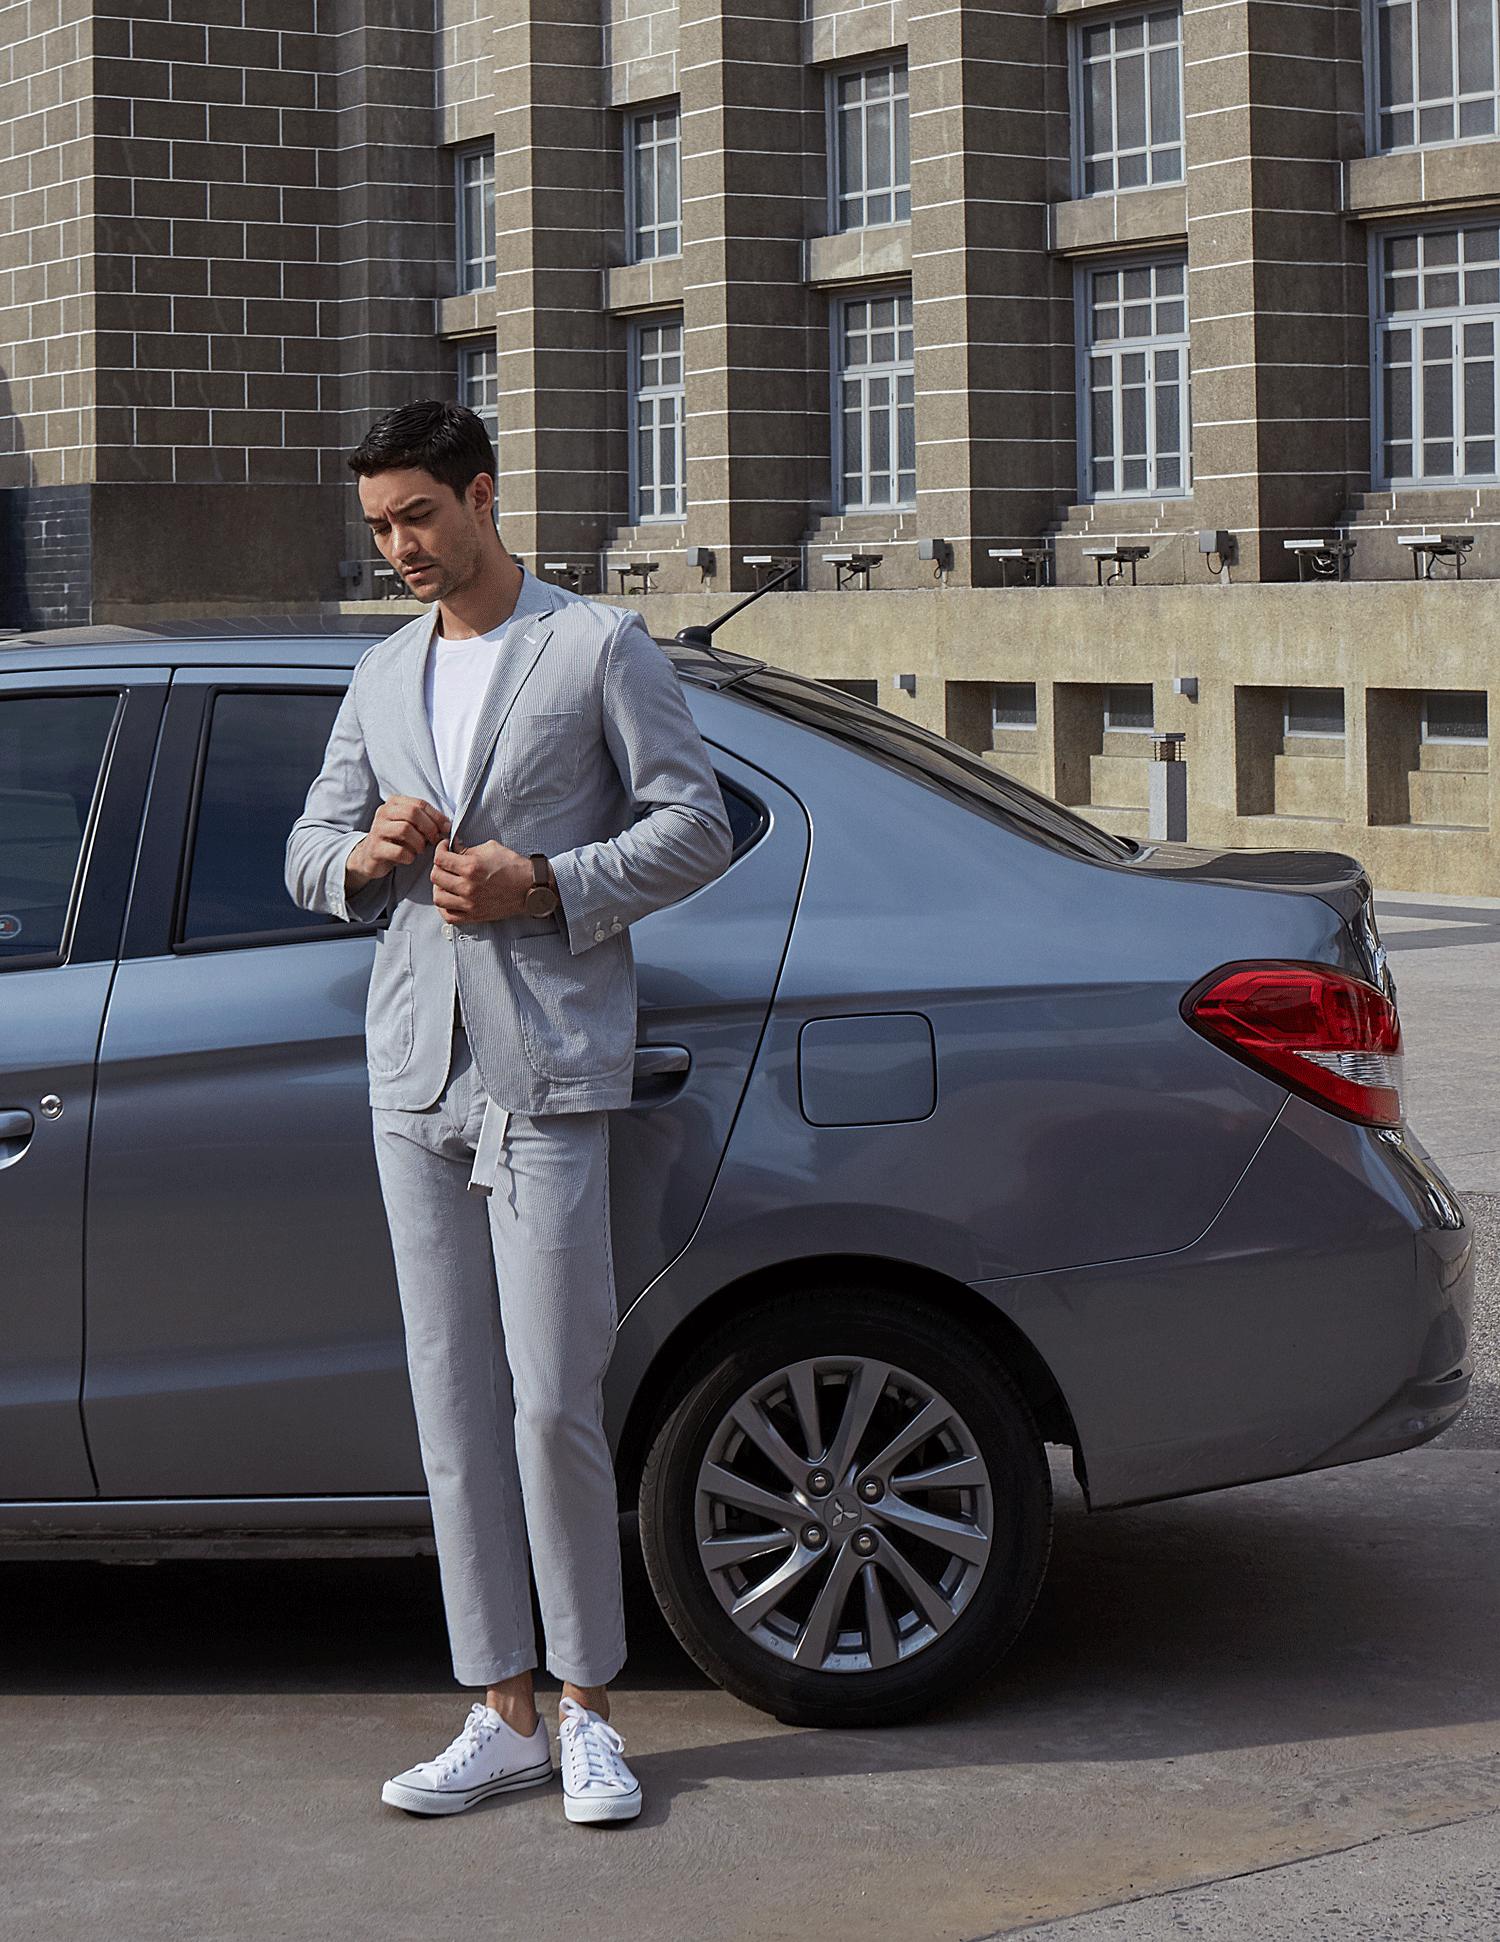 car : Mitsubishi NEW Attrage  clothes : MUJI